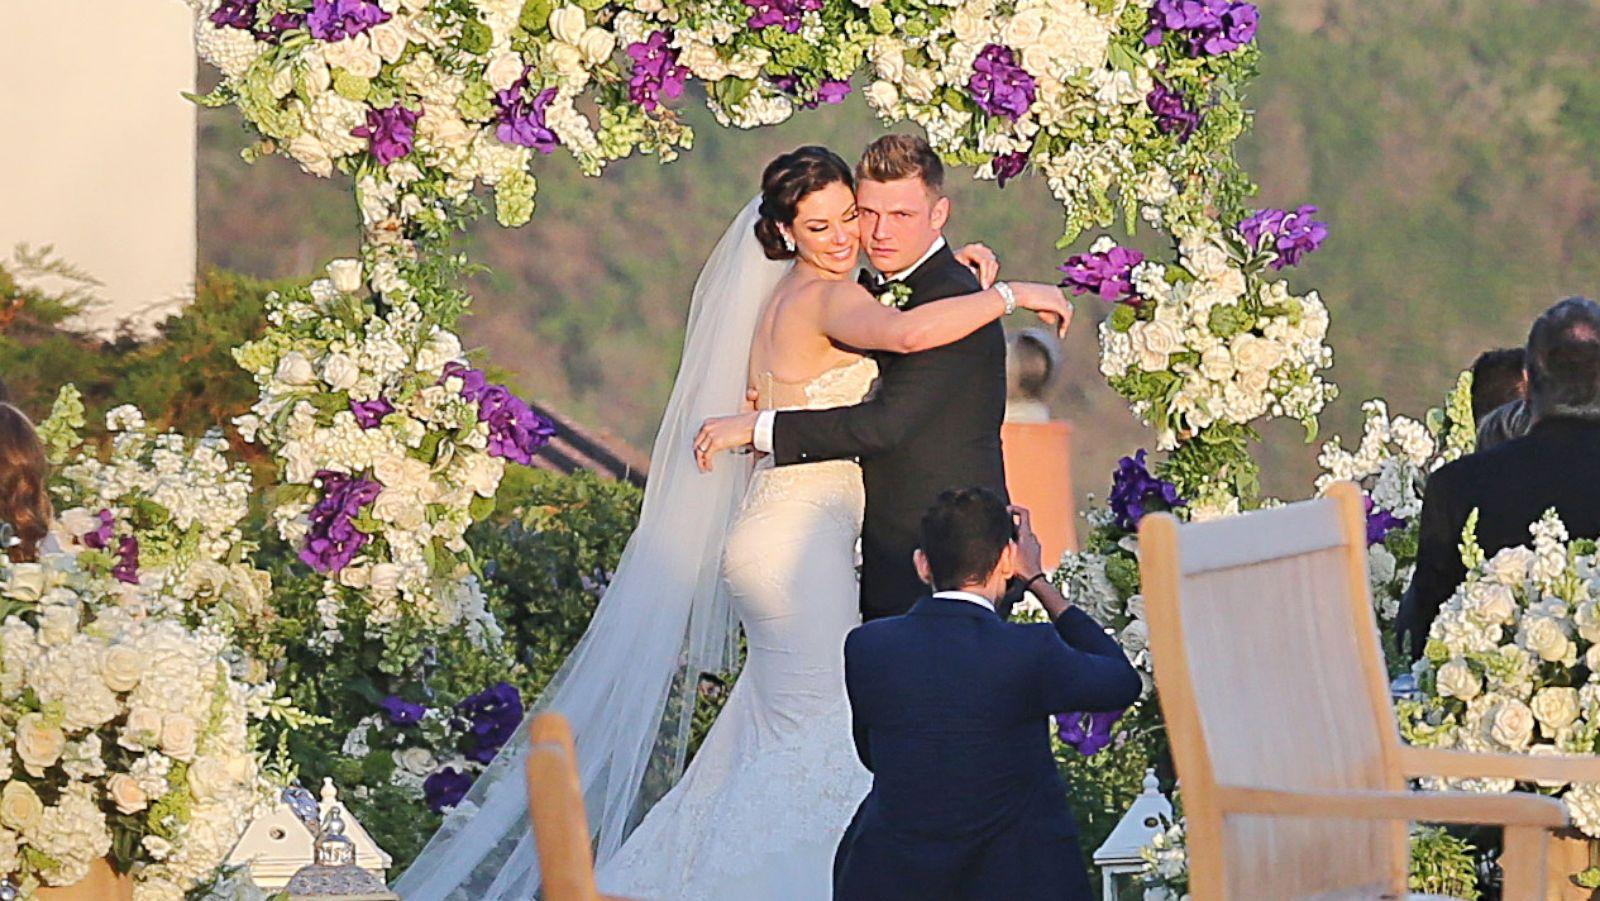 Backstreet Boys On Nick Carter S Wedding It Was Bittersweet Abc News